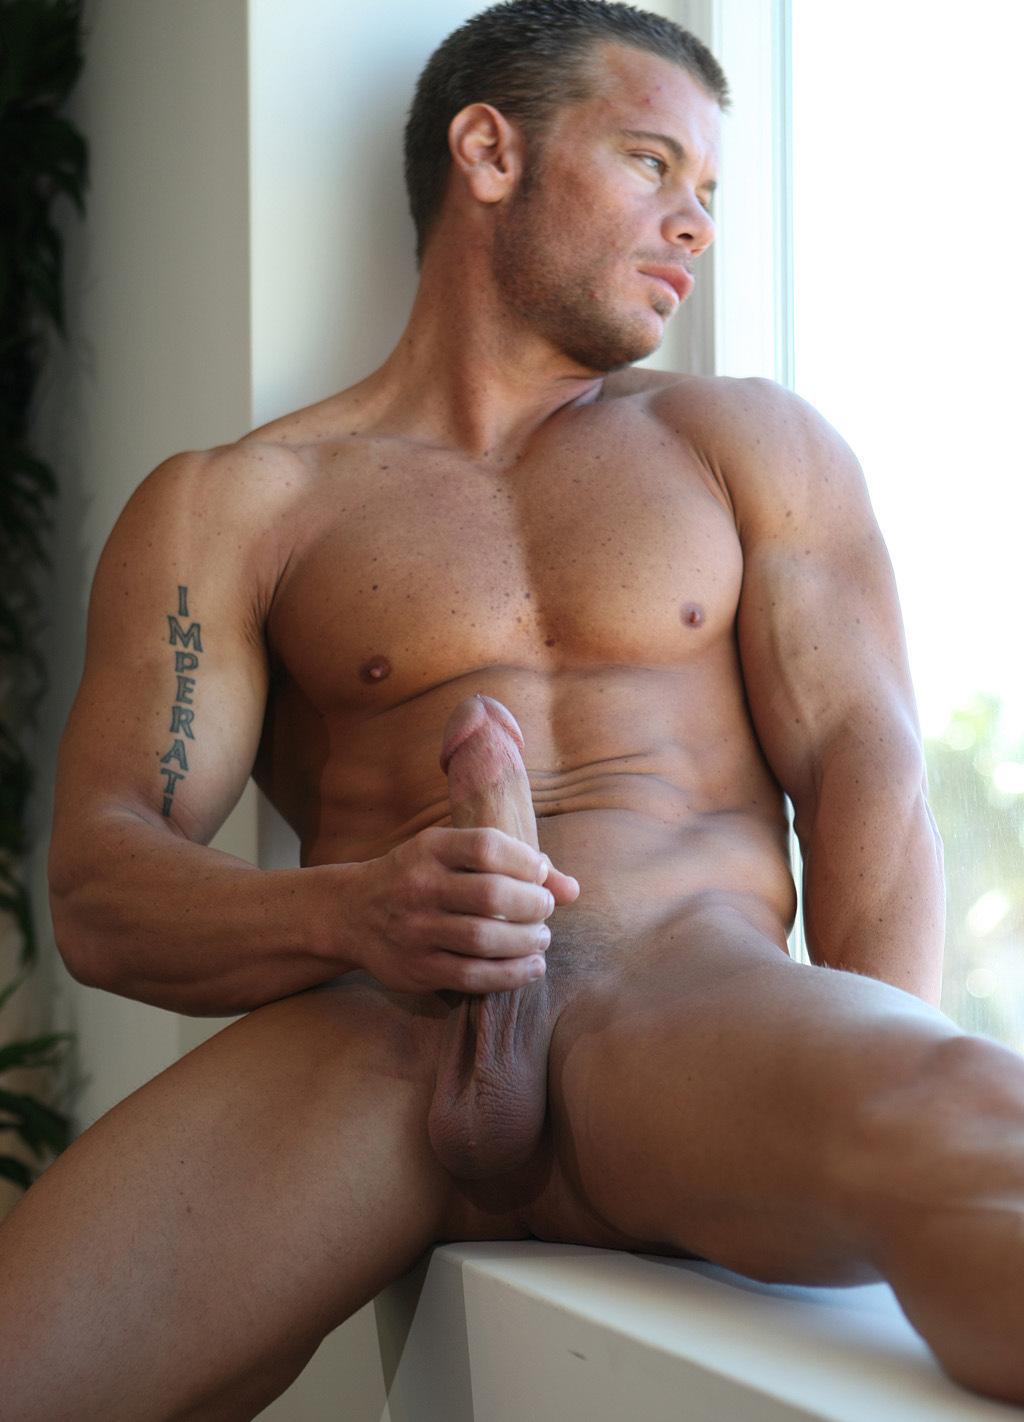 Порнушечка фото голых мужчин